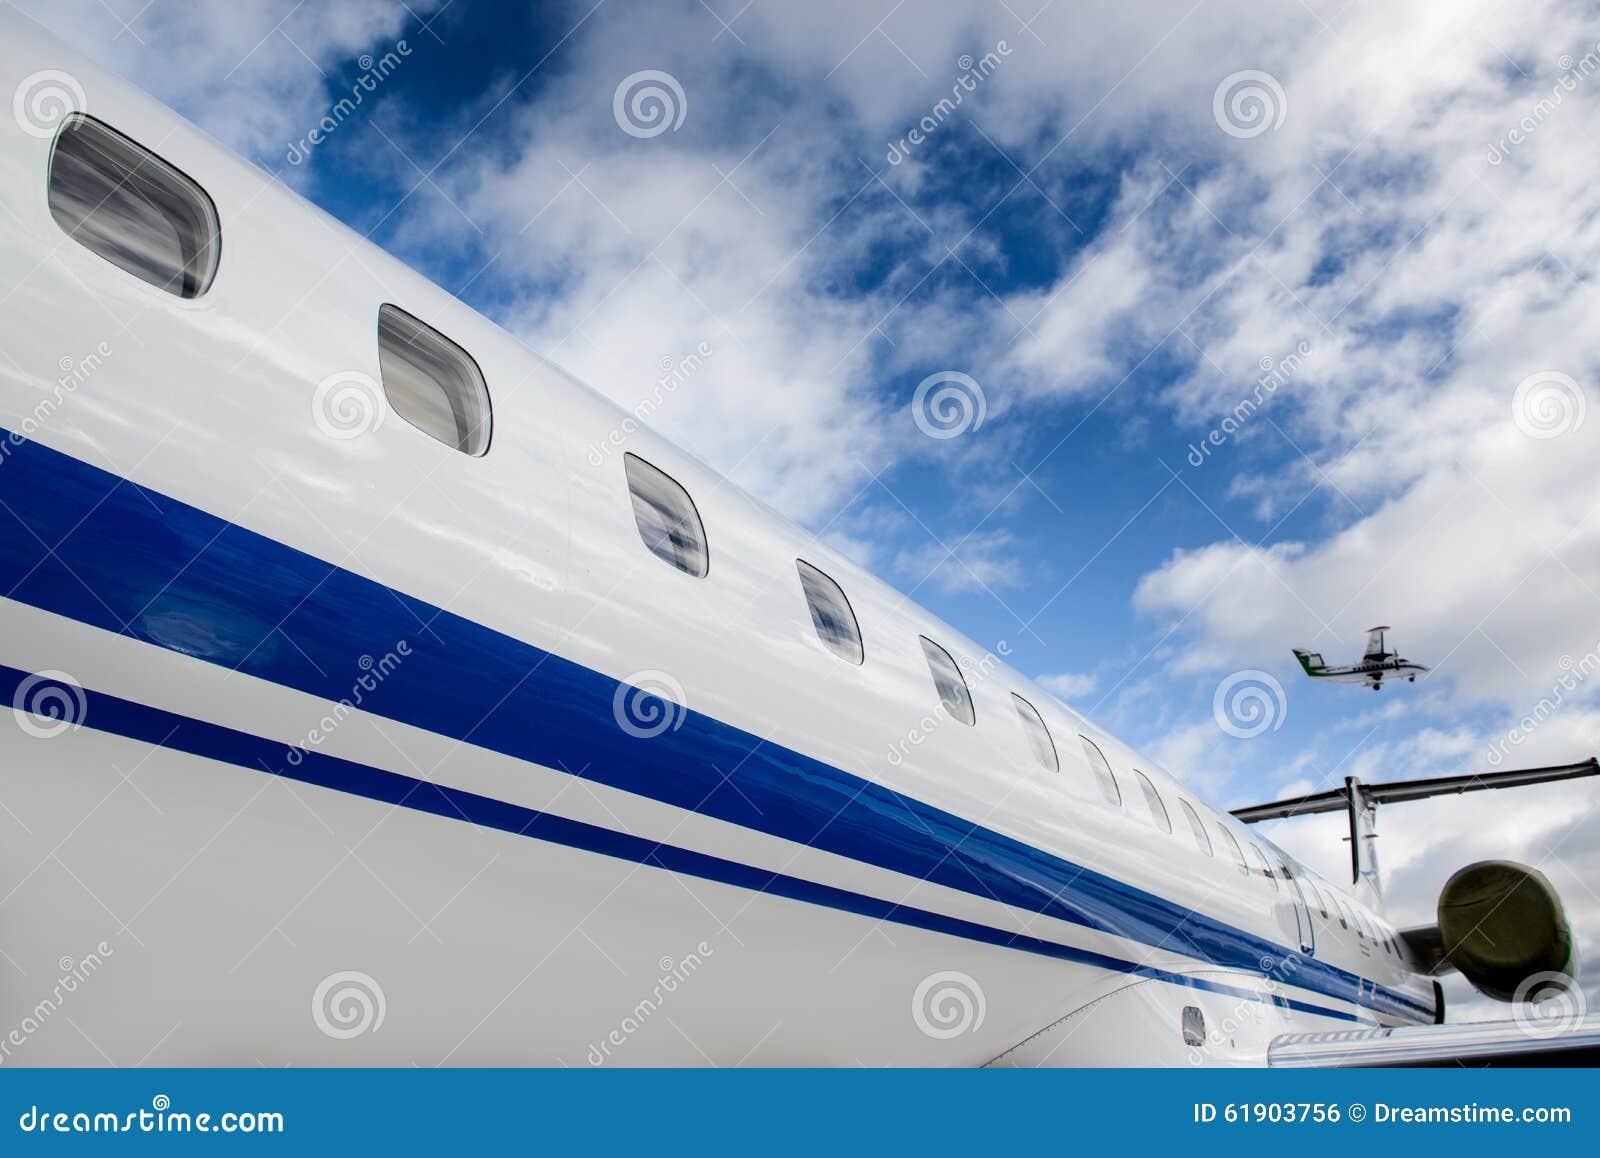 Let l-410 and Embraer ERJ 145